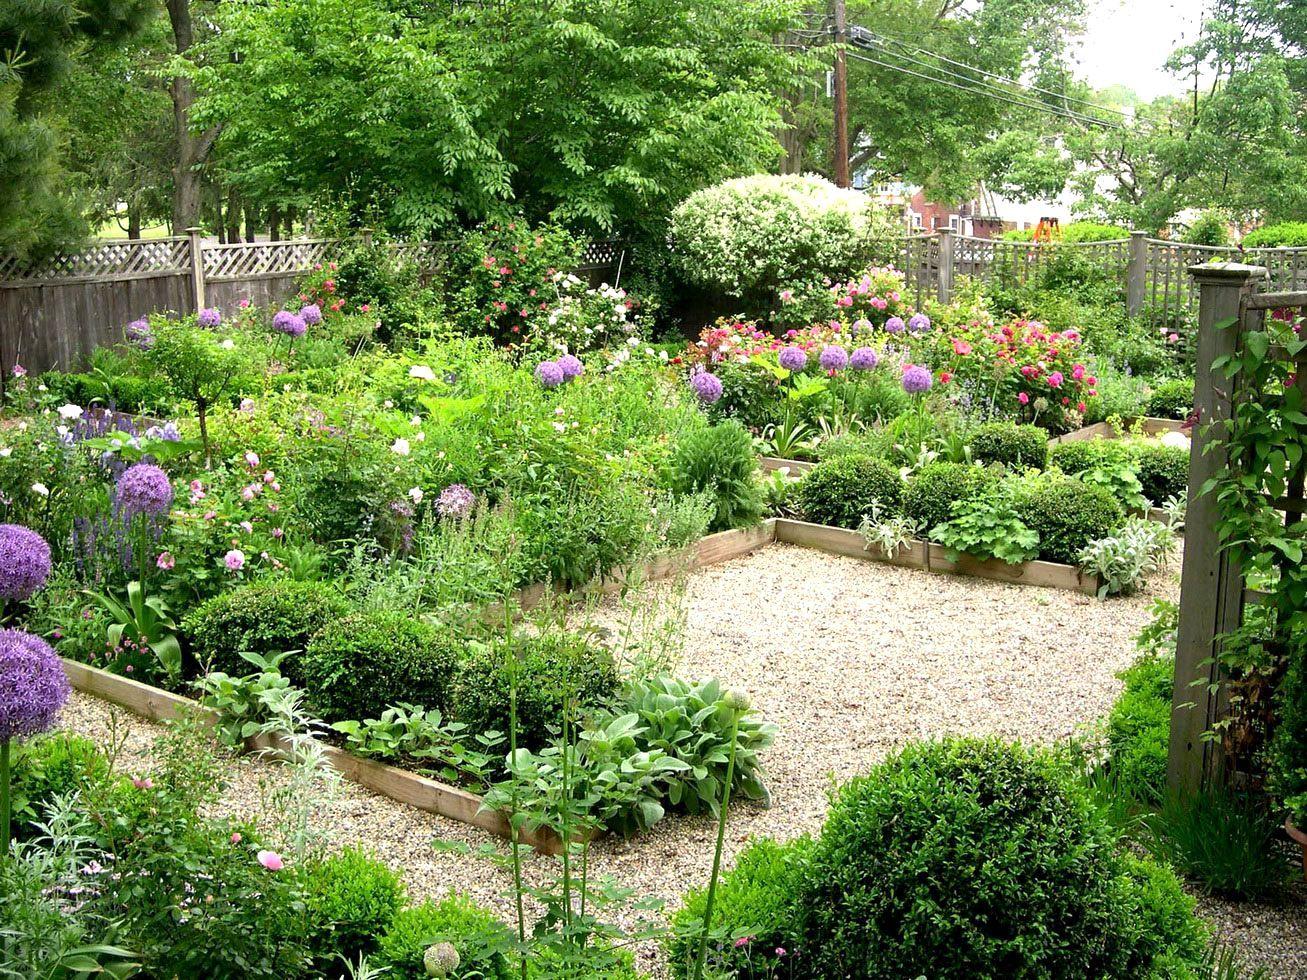 Garden Design Nz low maintenance garden designs nz contemporary garden design ideas